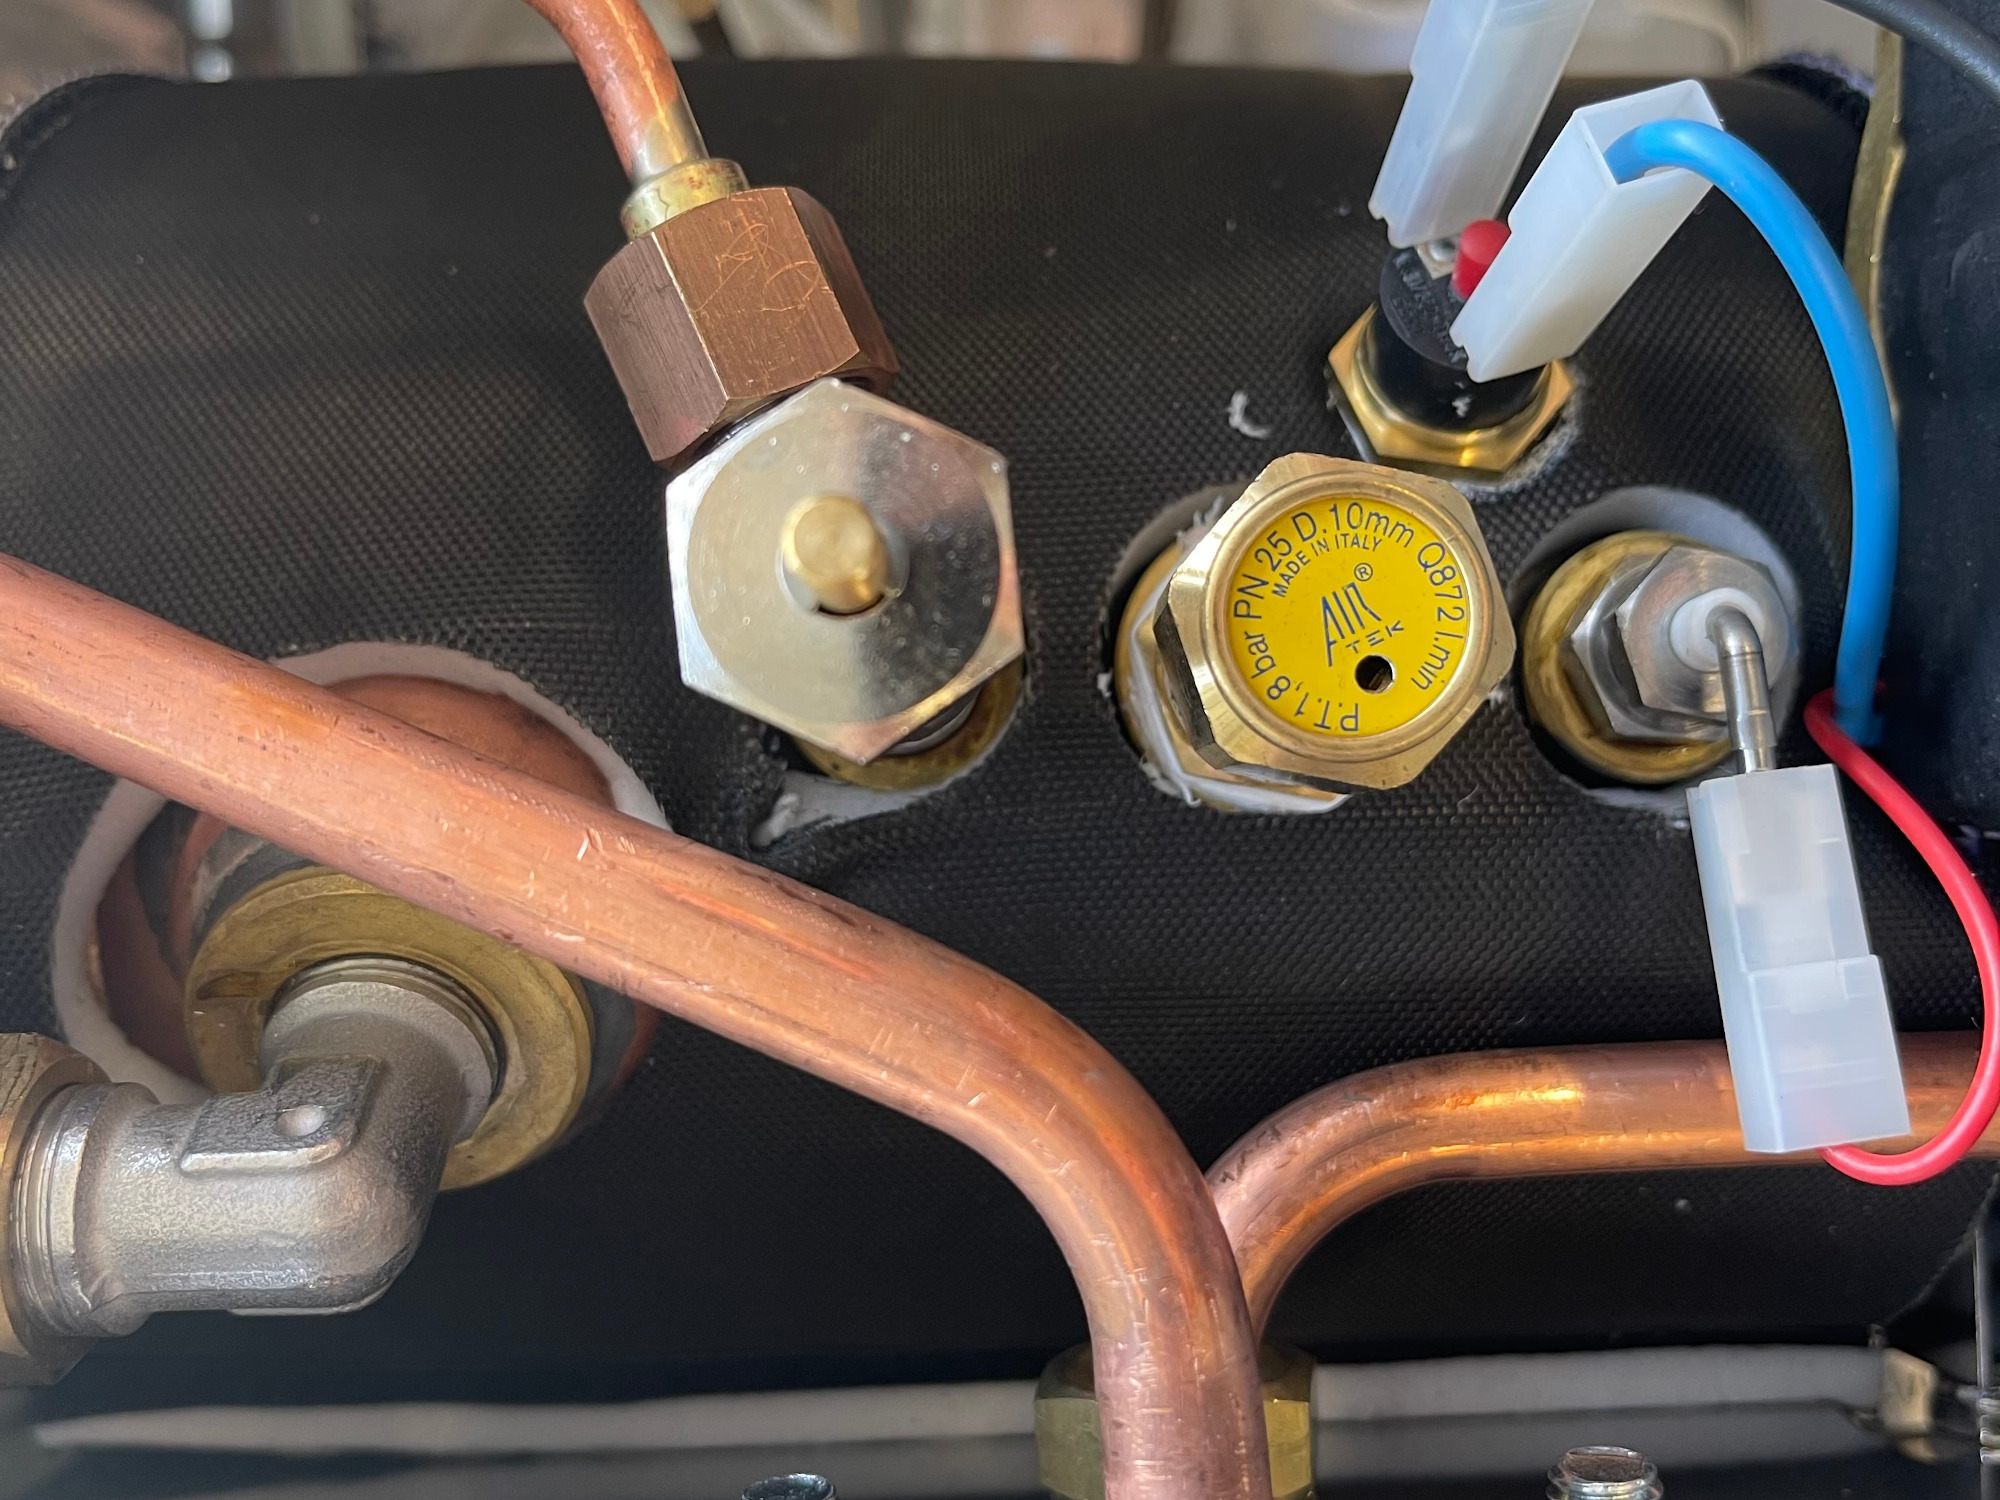 giotto-insulated-boiler.jpg